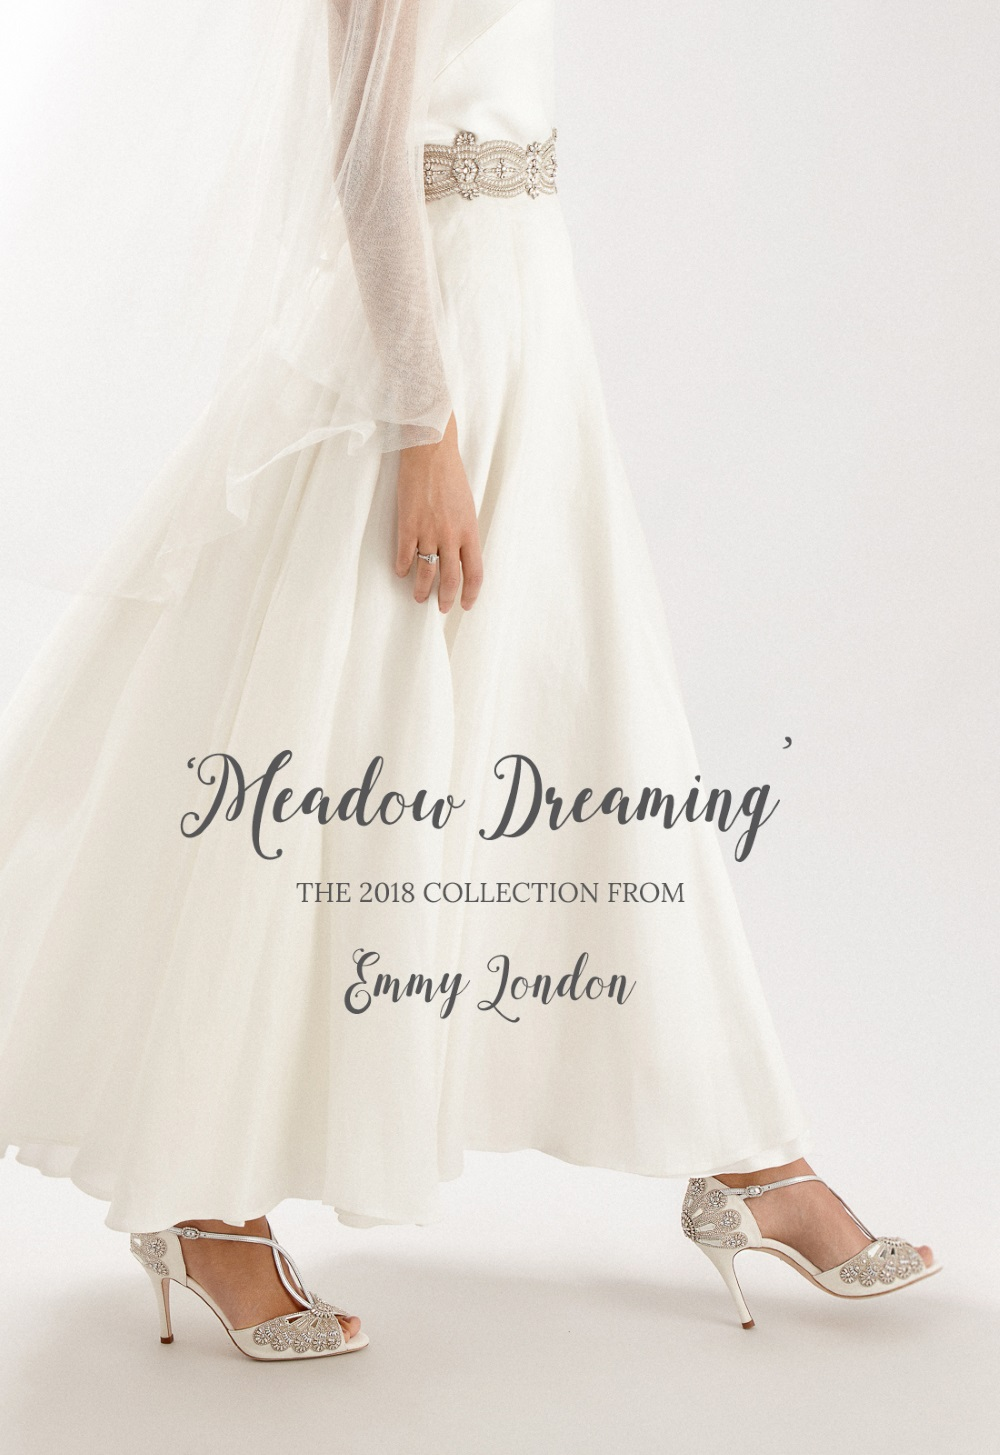 Meadow Dreaming